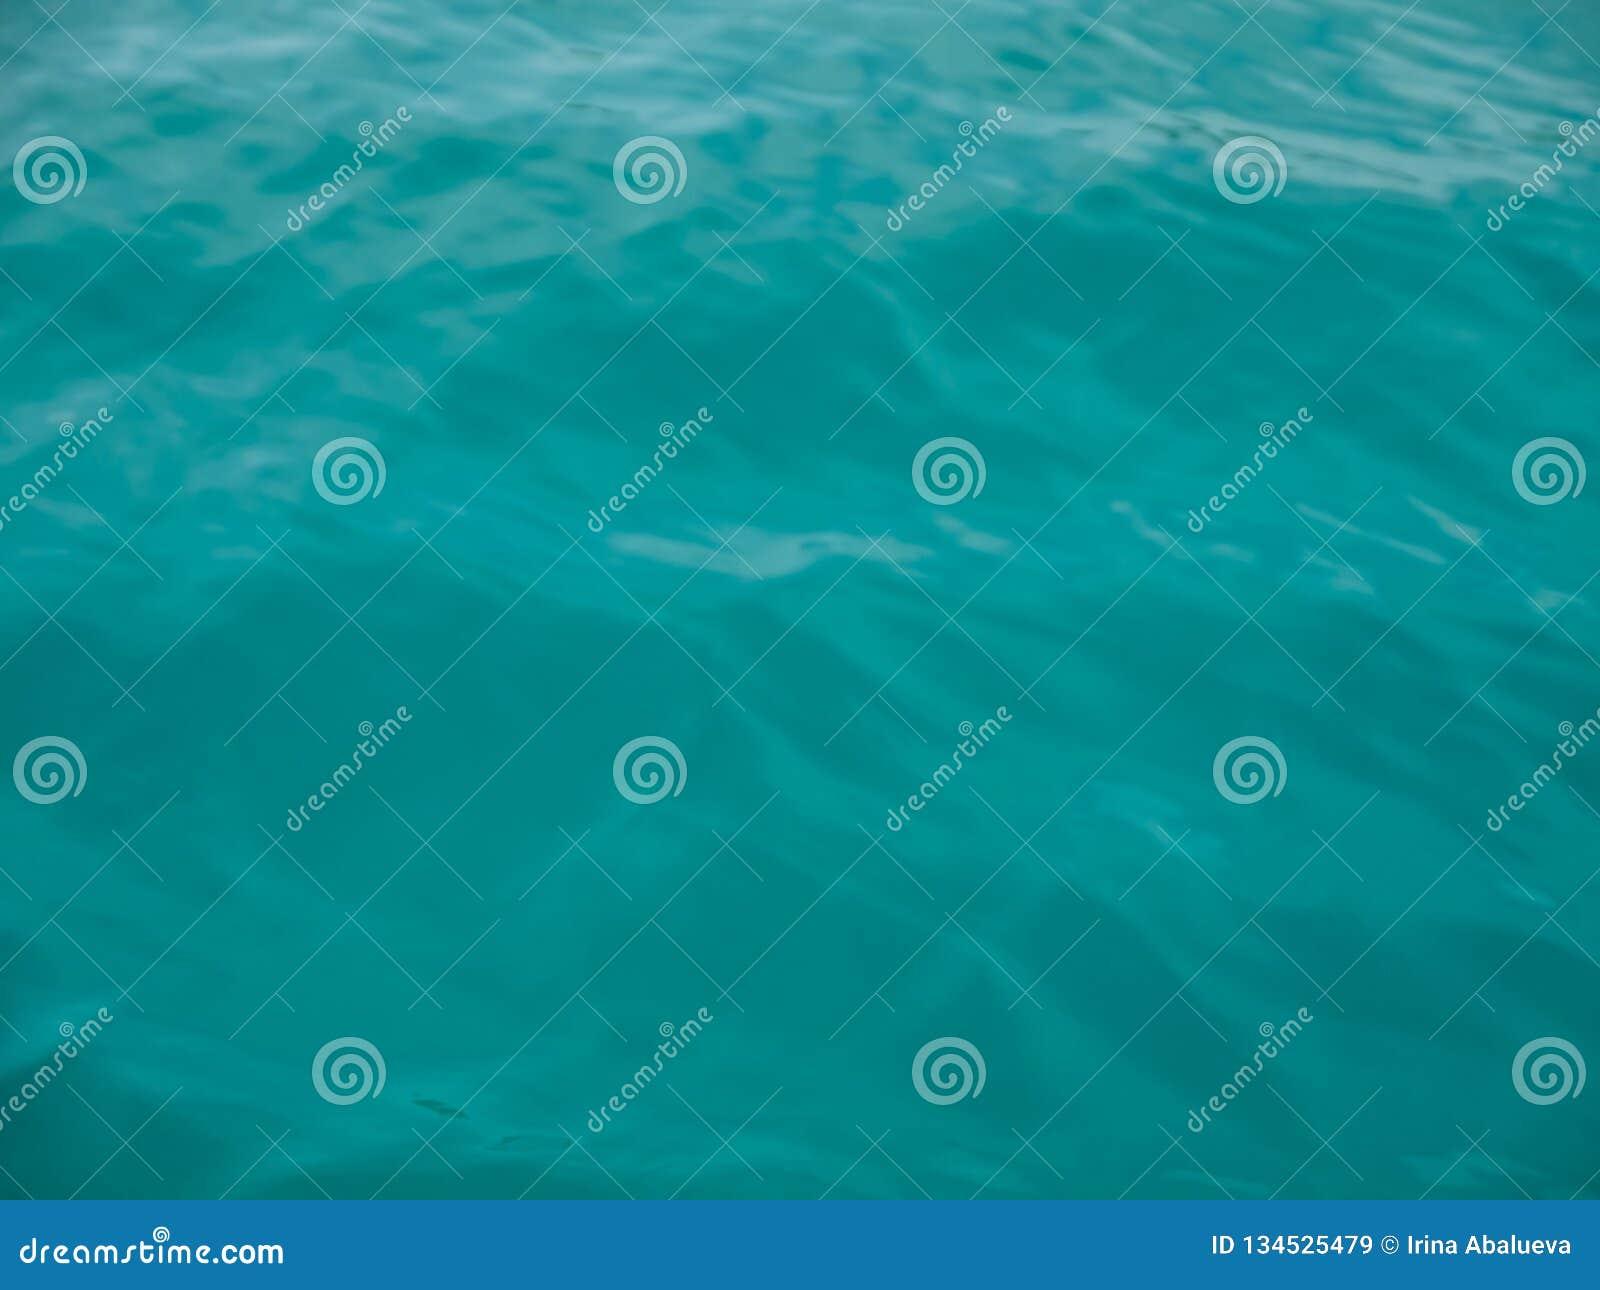 Turquoise sea wave splashing overboard